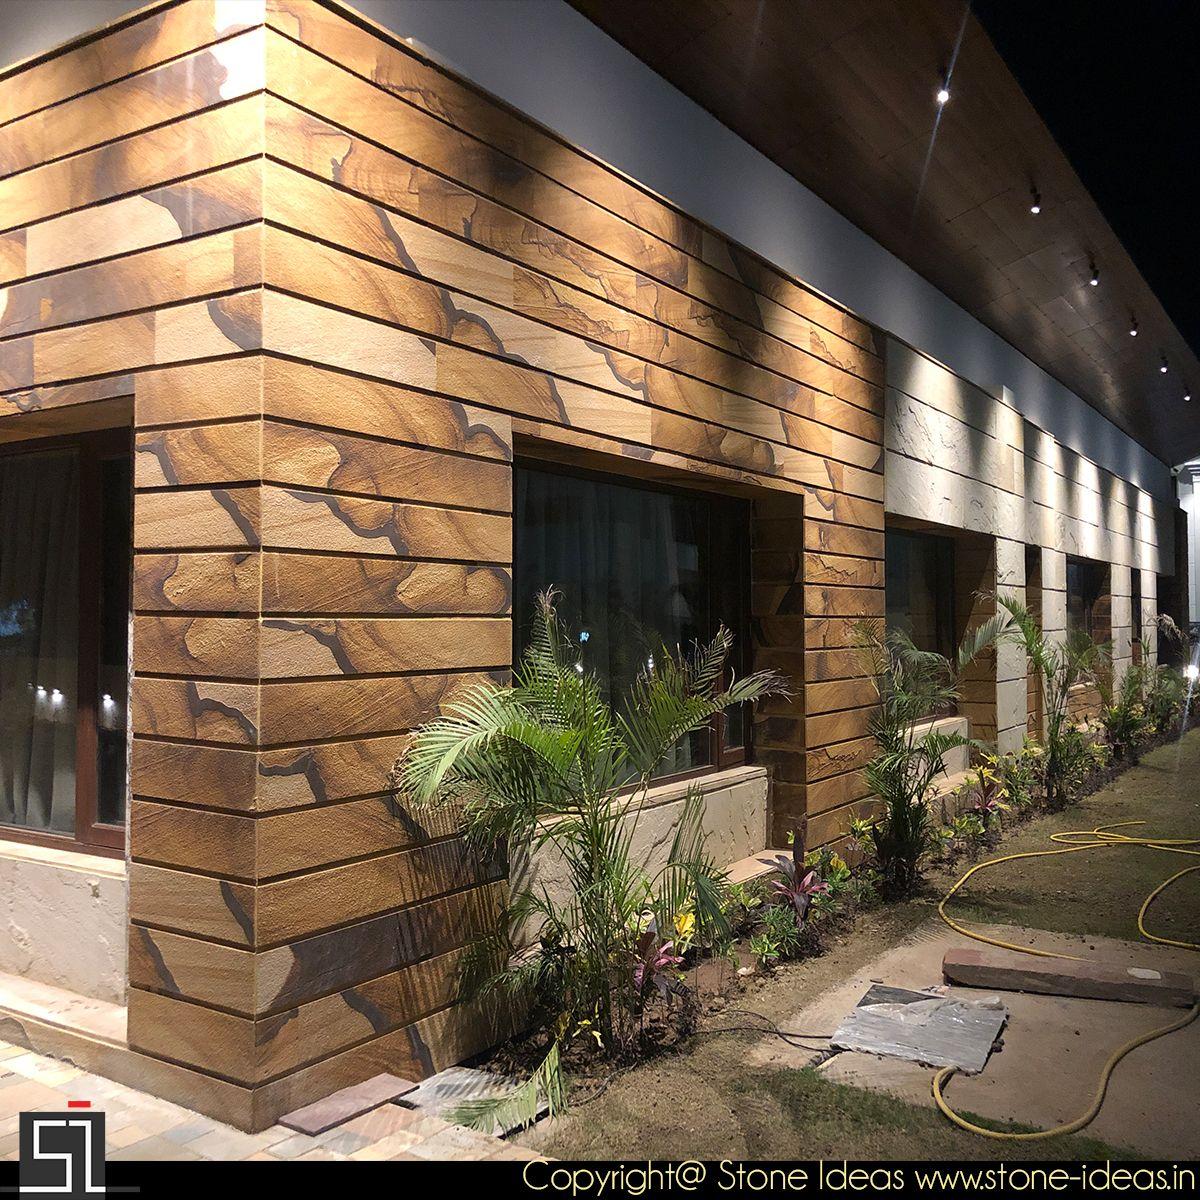 Wood Wall Tiles Design For Outside House